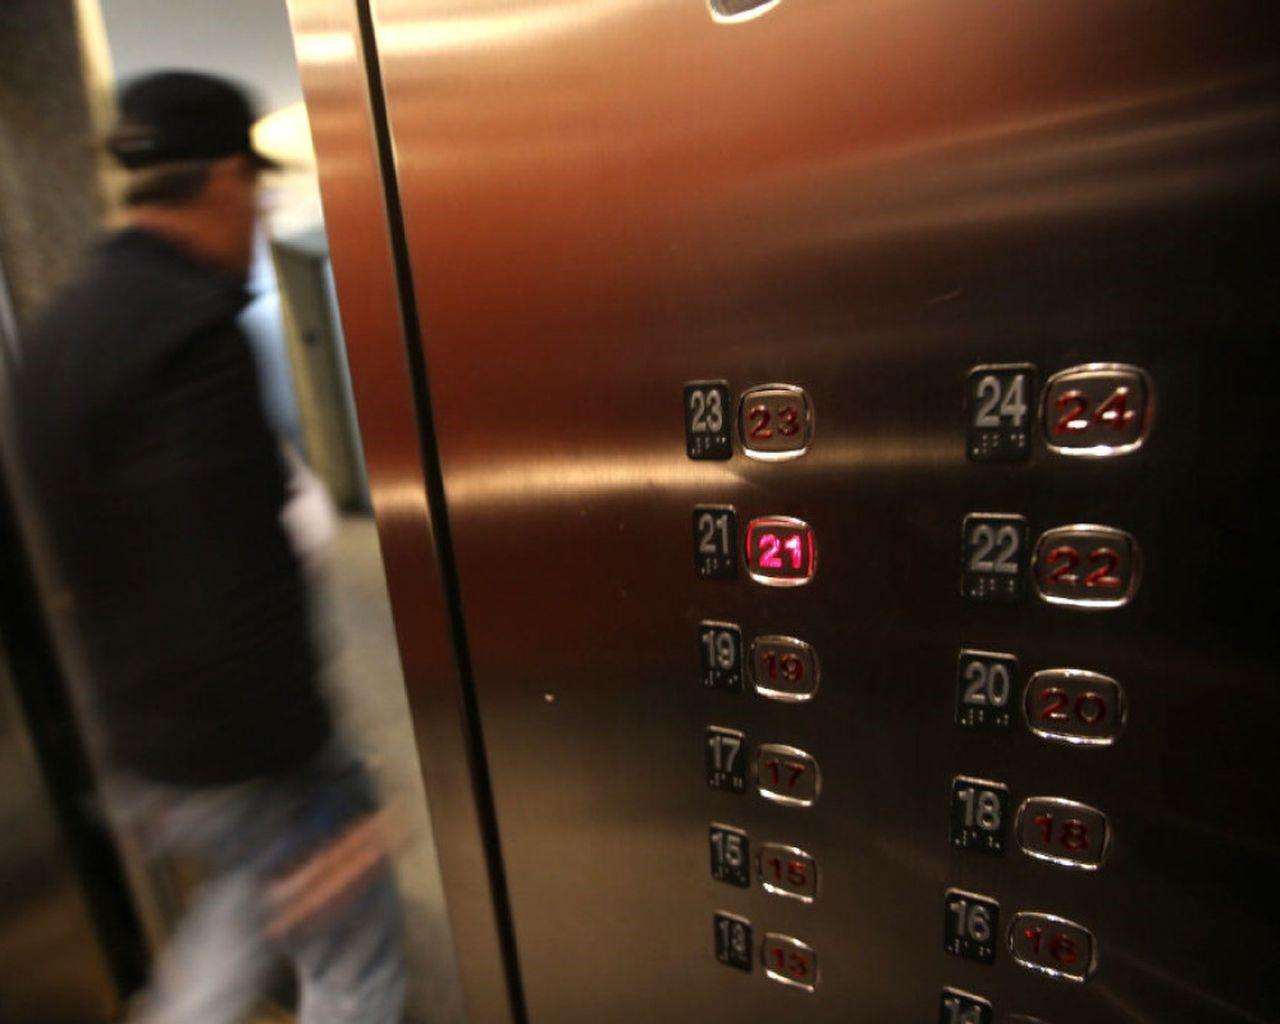 خطرات پله برقی,پله برقی و آسانسور,خطر آسانسور